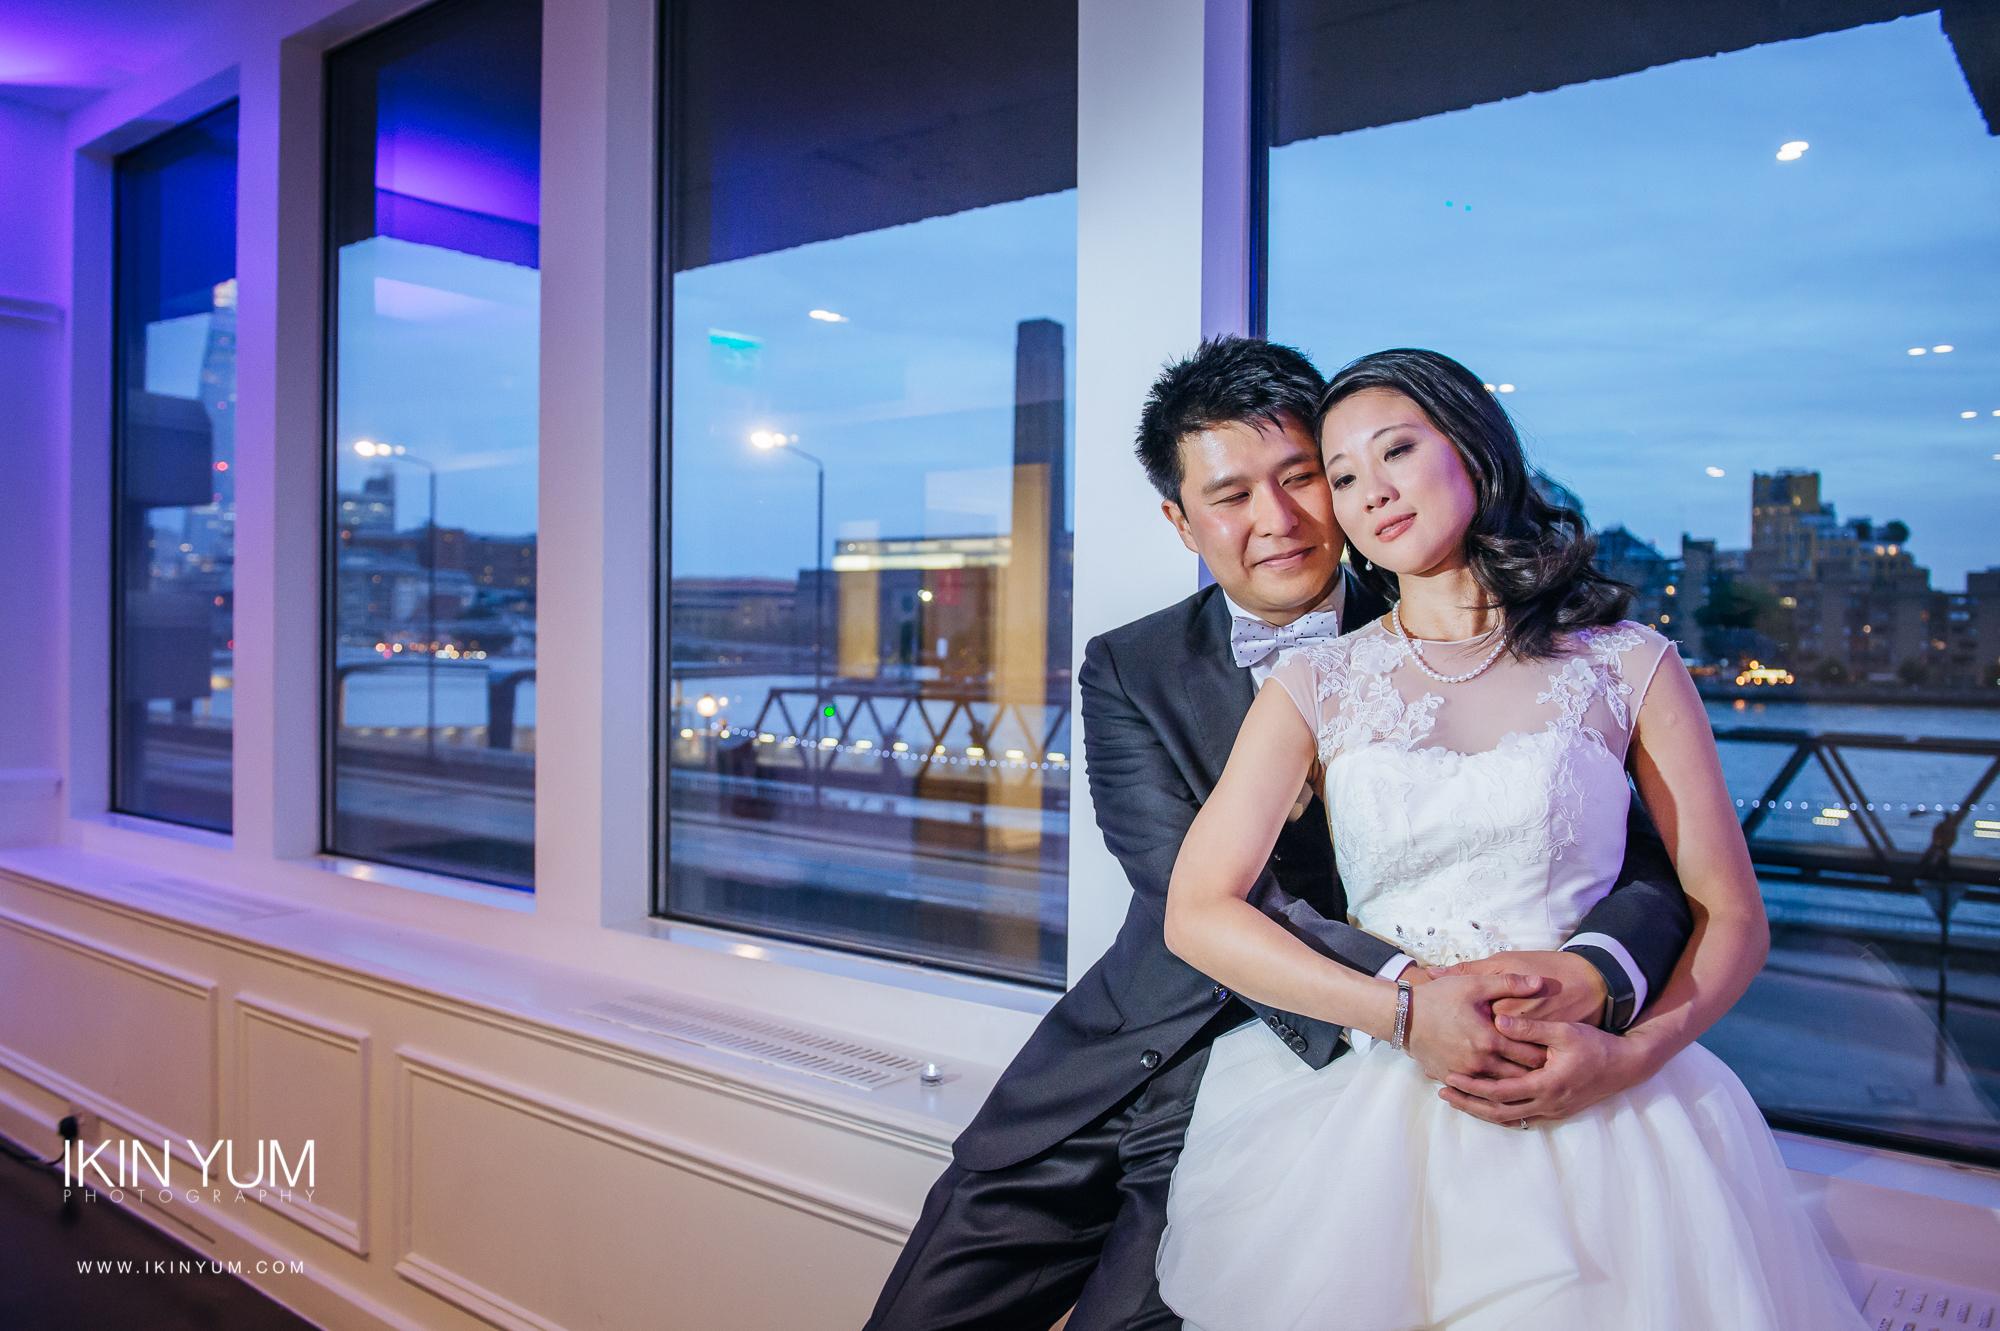 Mermaid river rooms Wedding - Ikin Yum Photography-081.jpg